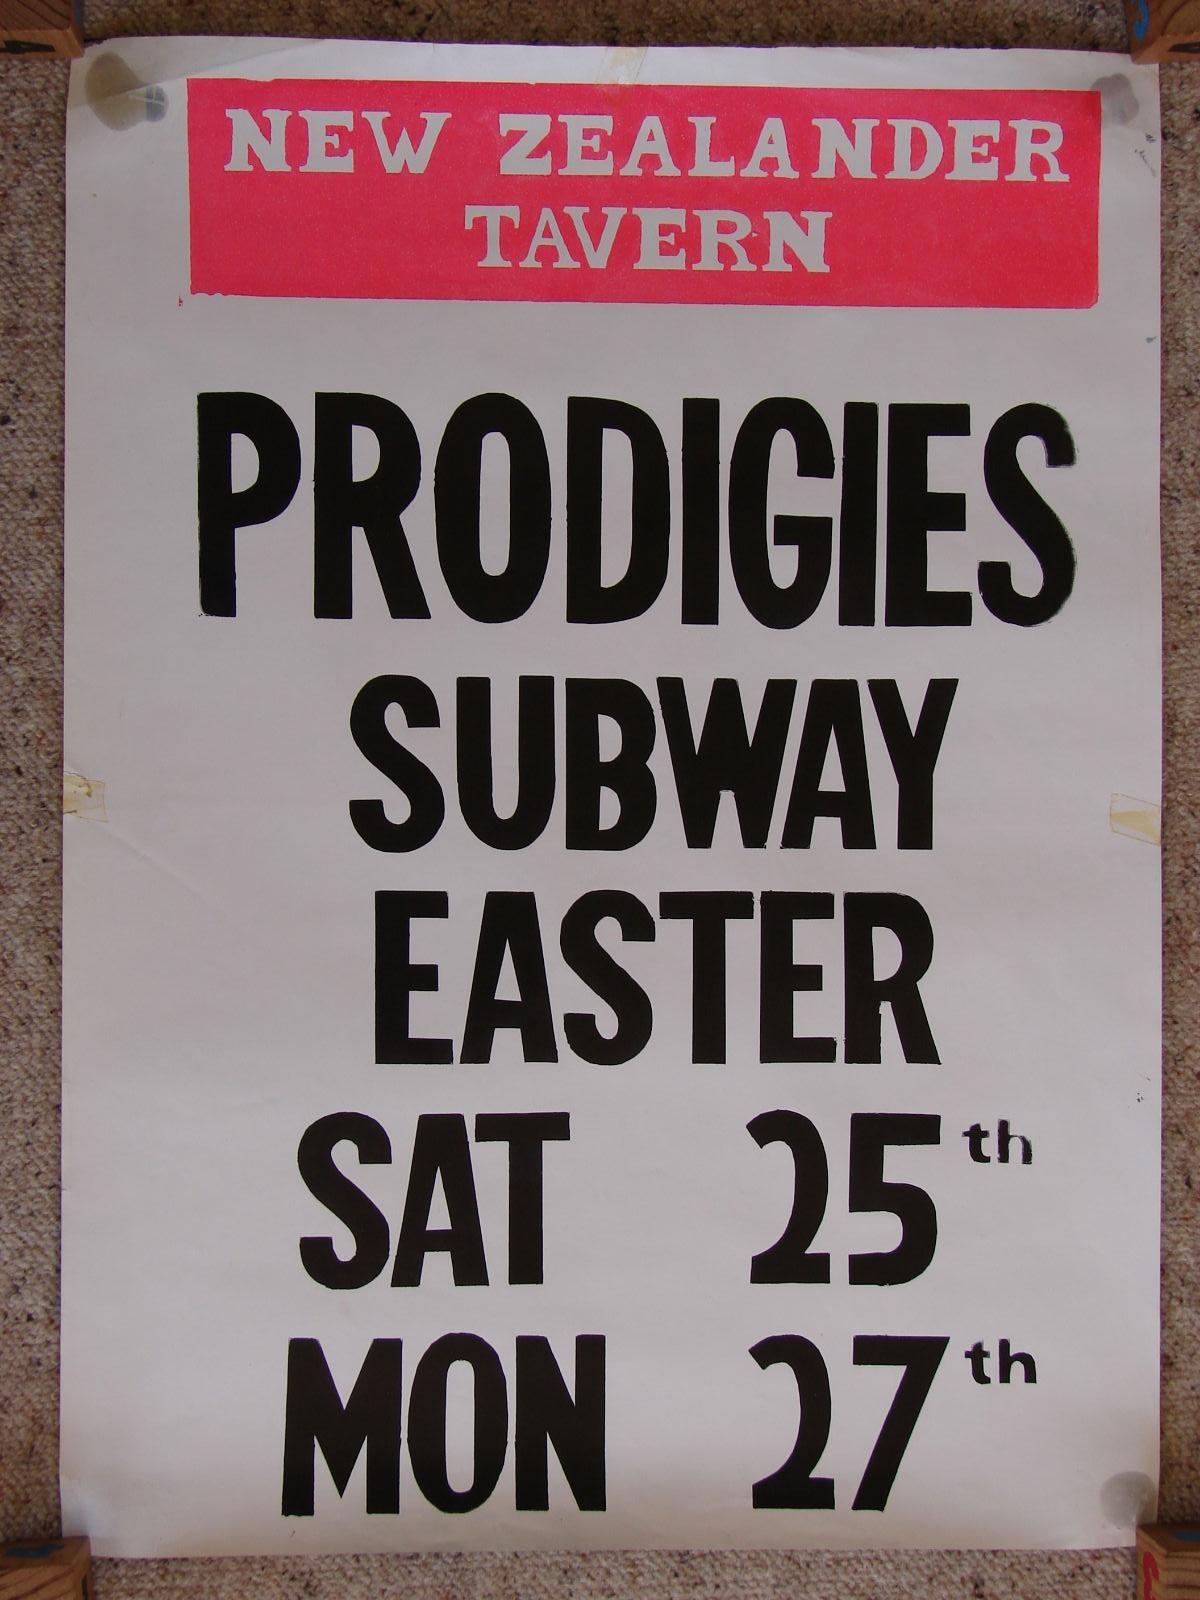 Prodigies at New Zealander Tavern